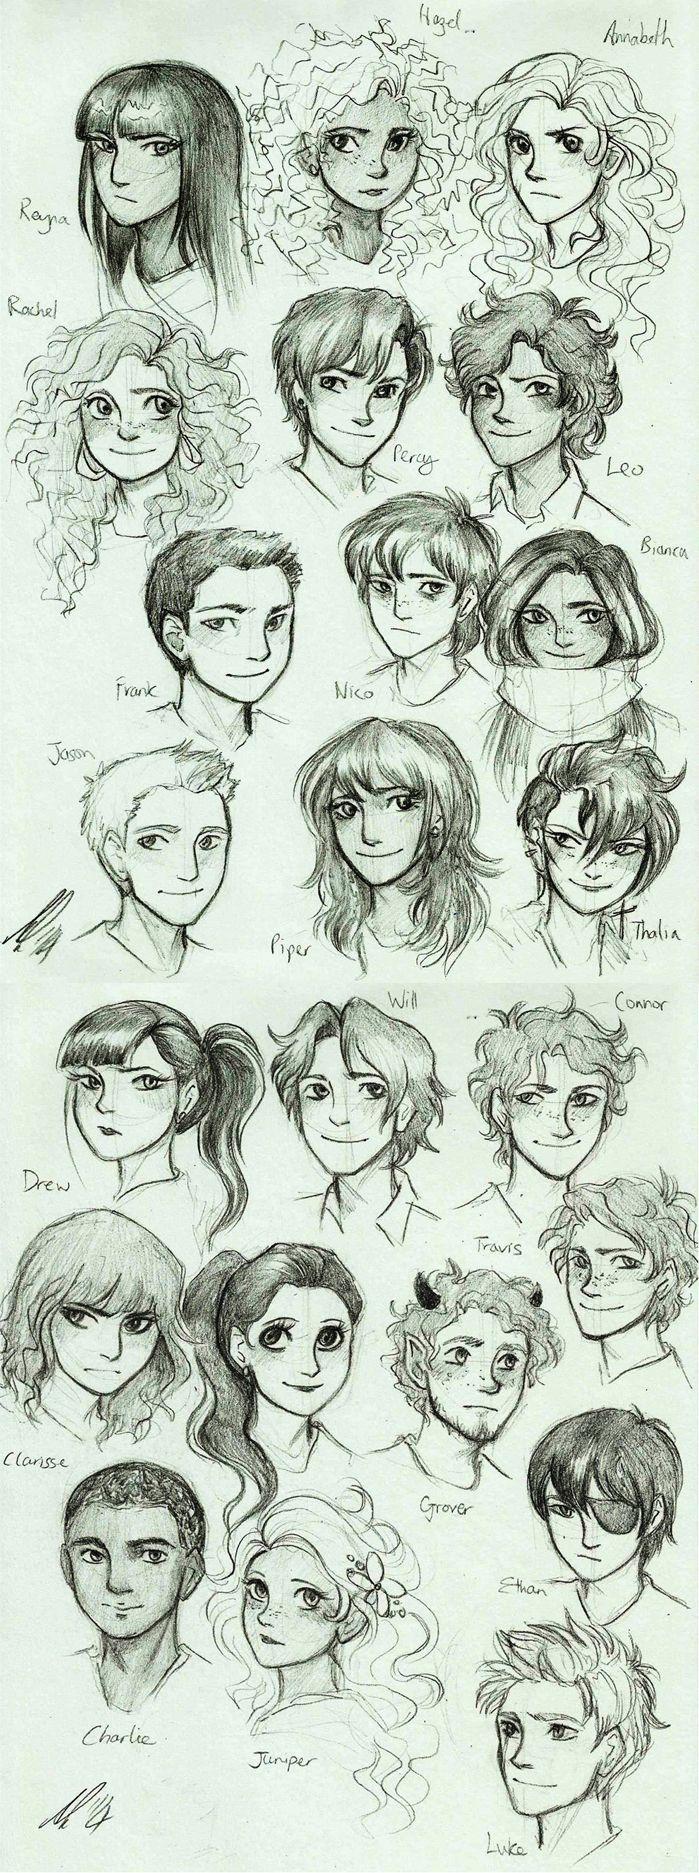 percy jackson drawings heroes of olympus - Cerca con Google